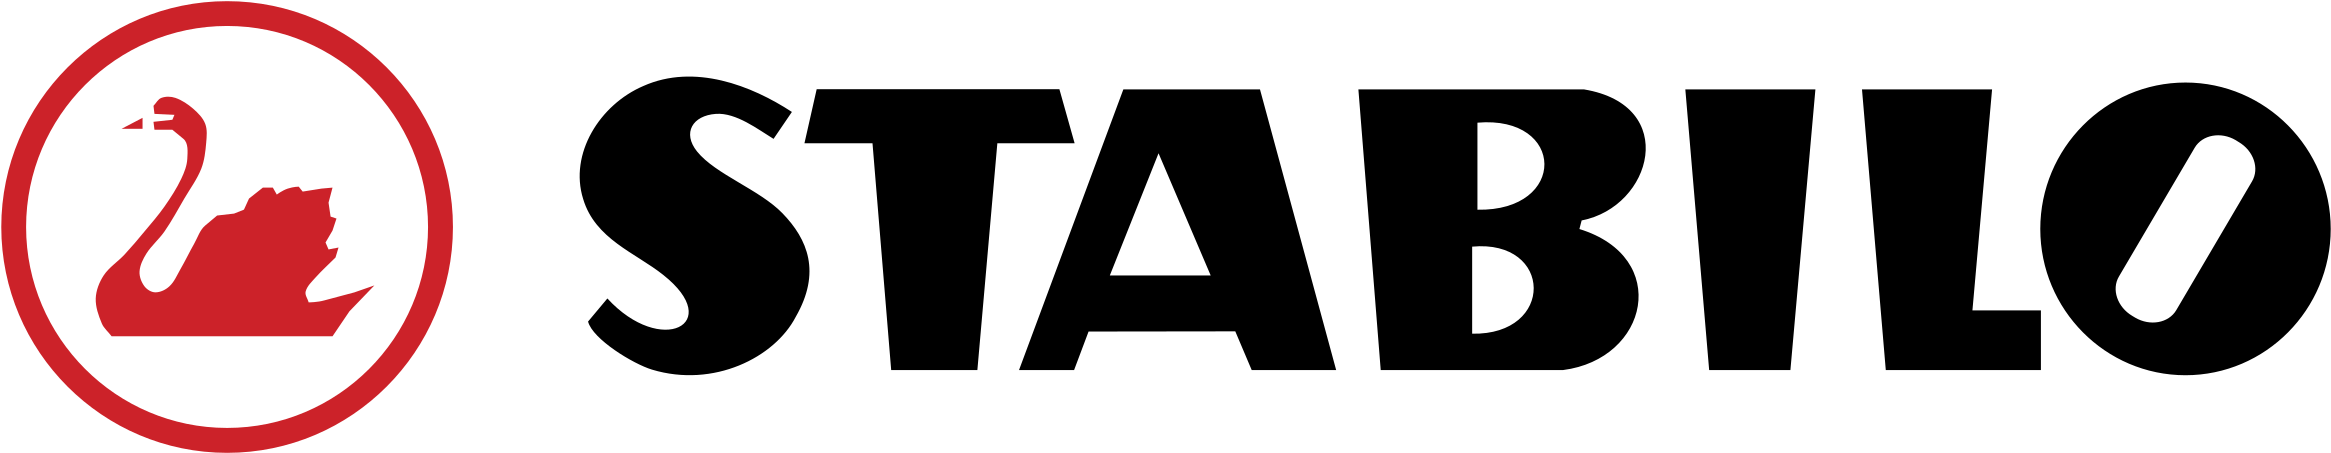 229-2294786_stabilo-logo-png-transparent-sign